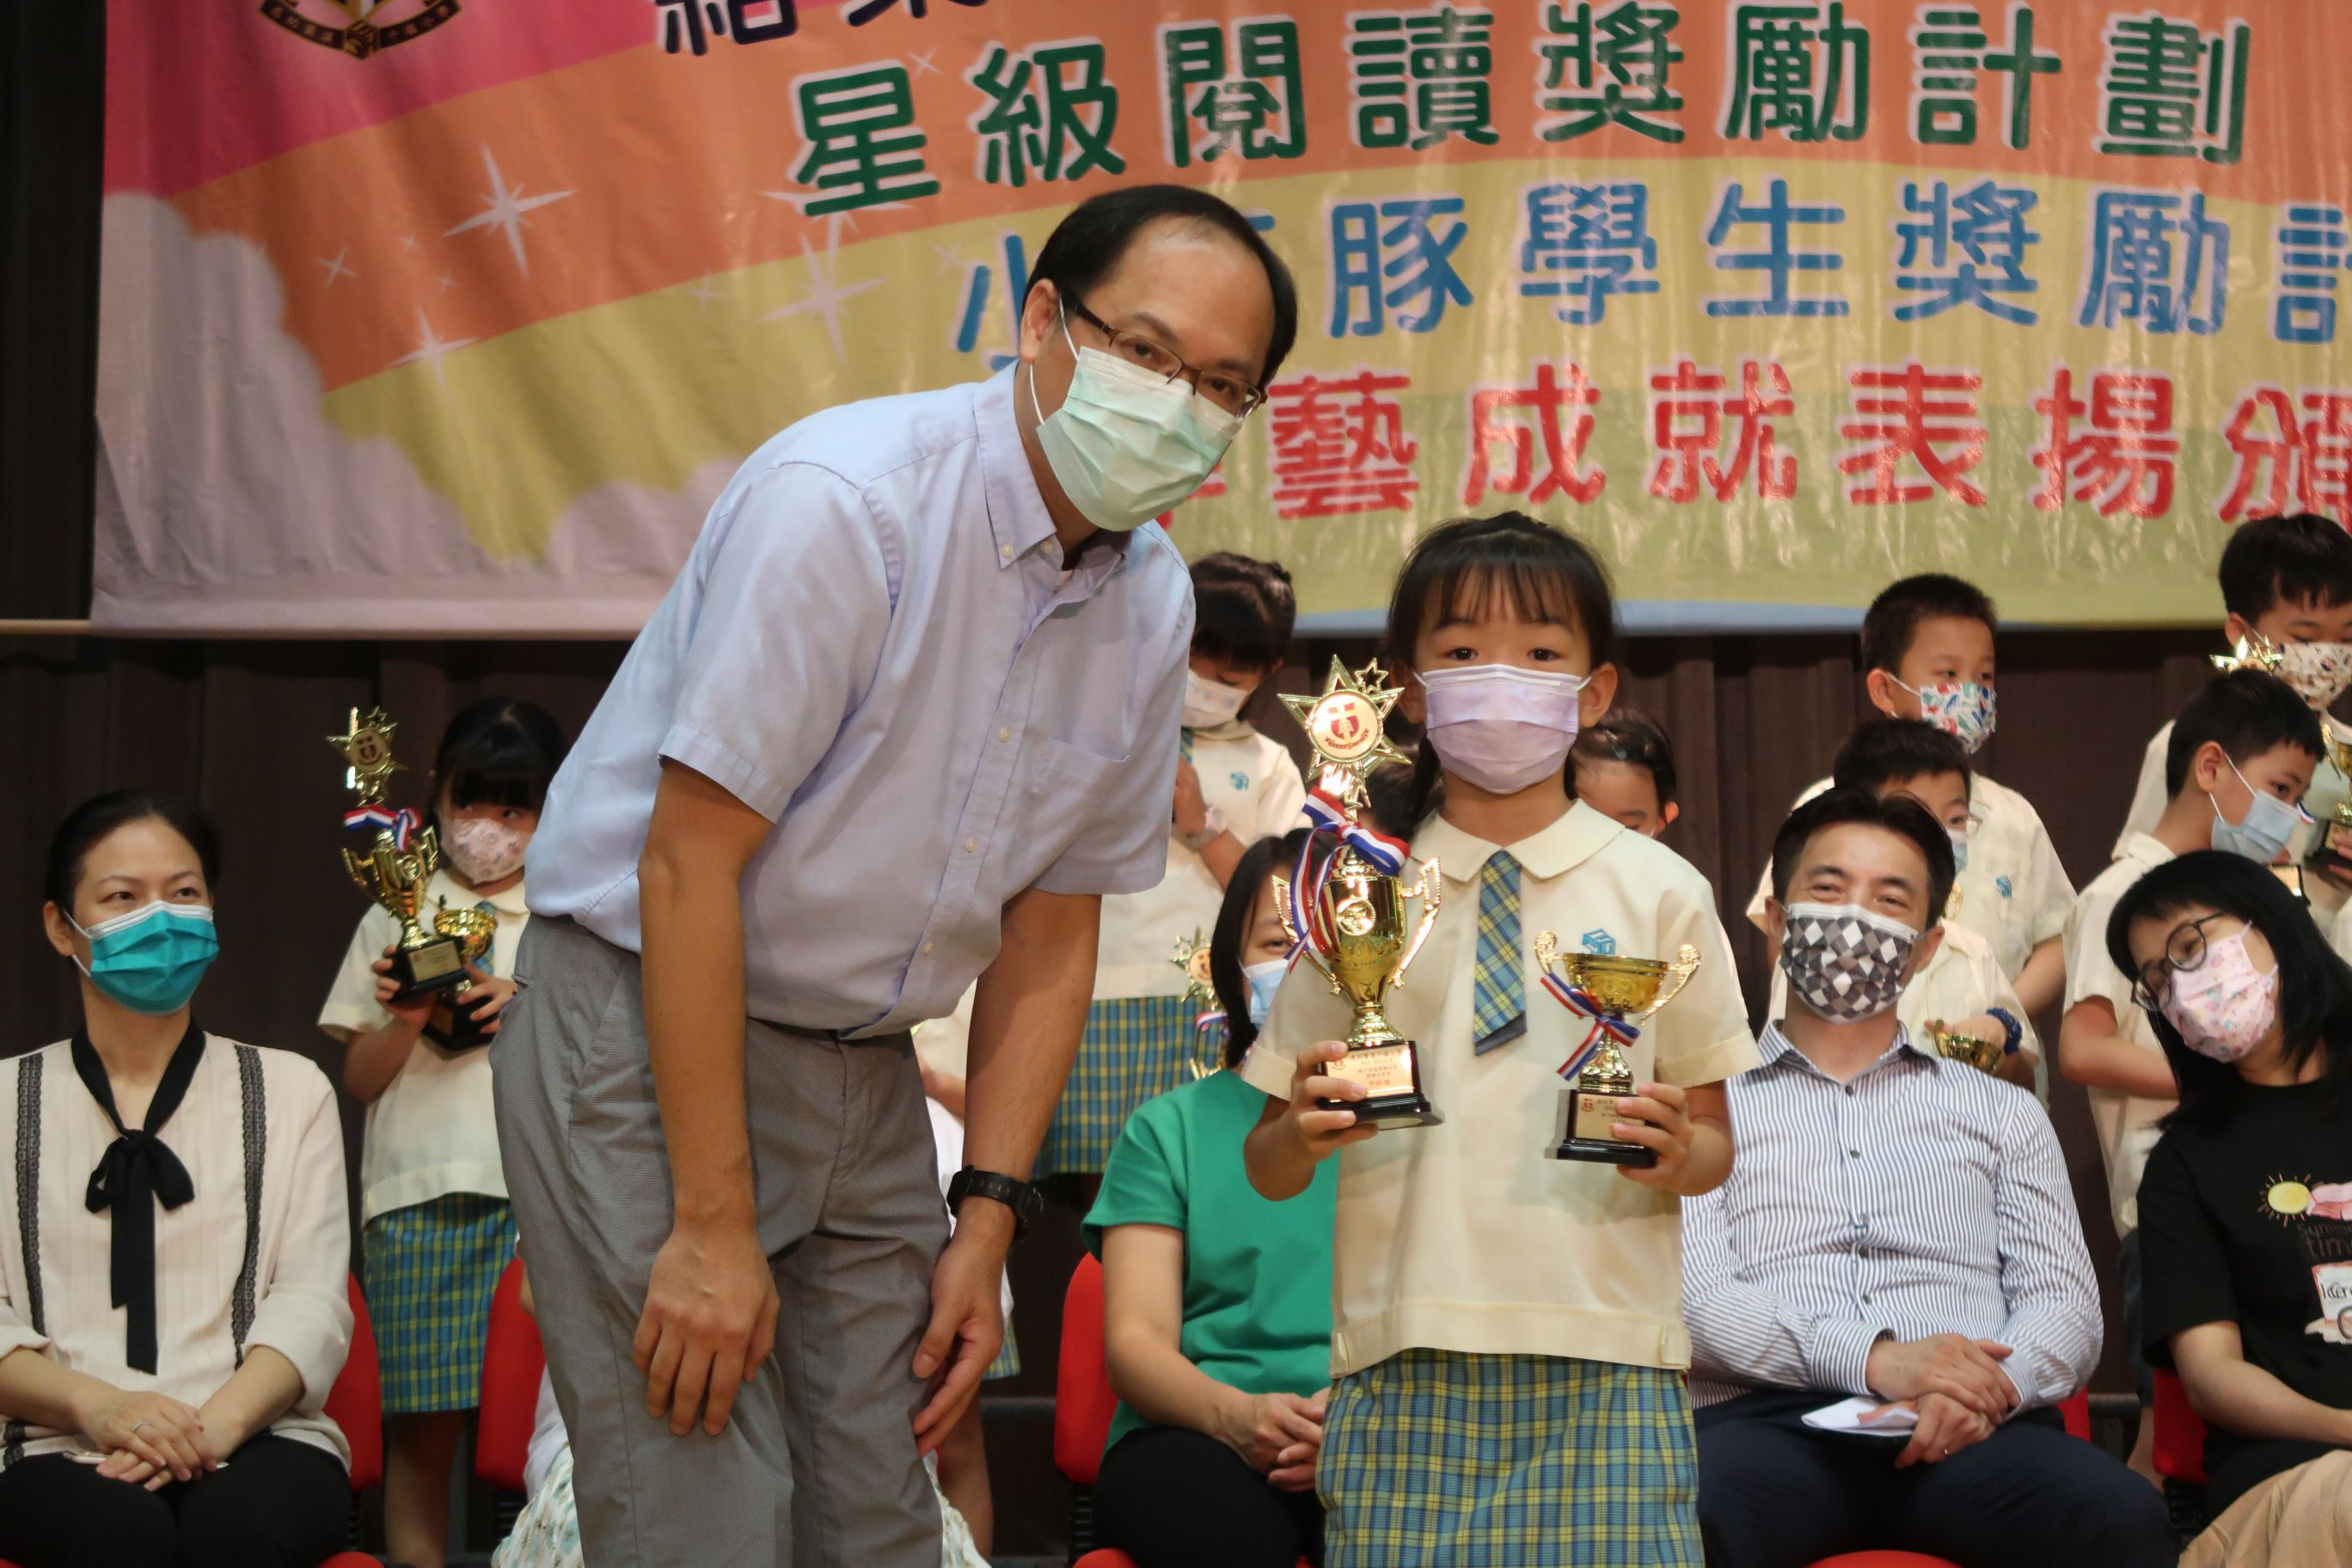 https://syh.edu.hk/sites/default/files/img_5822.jpg